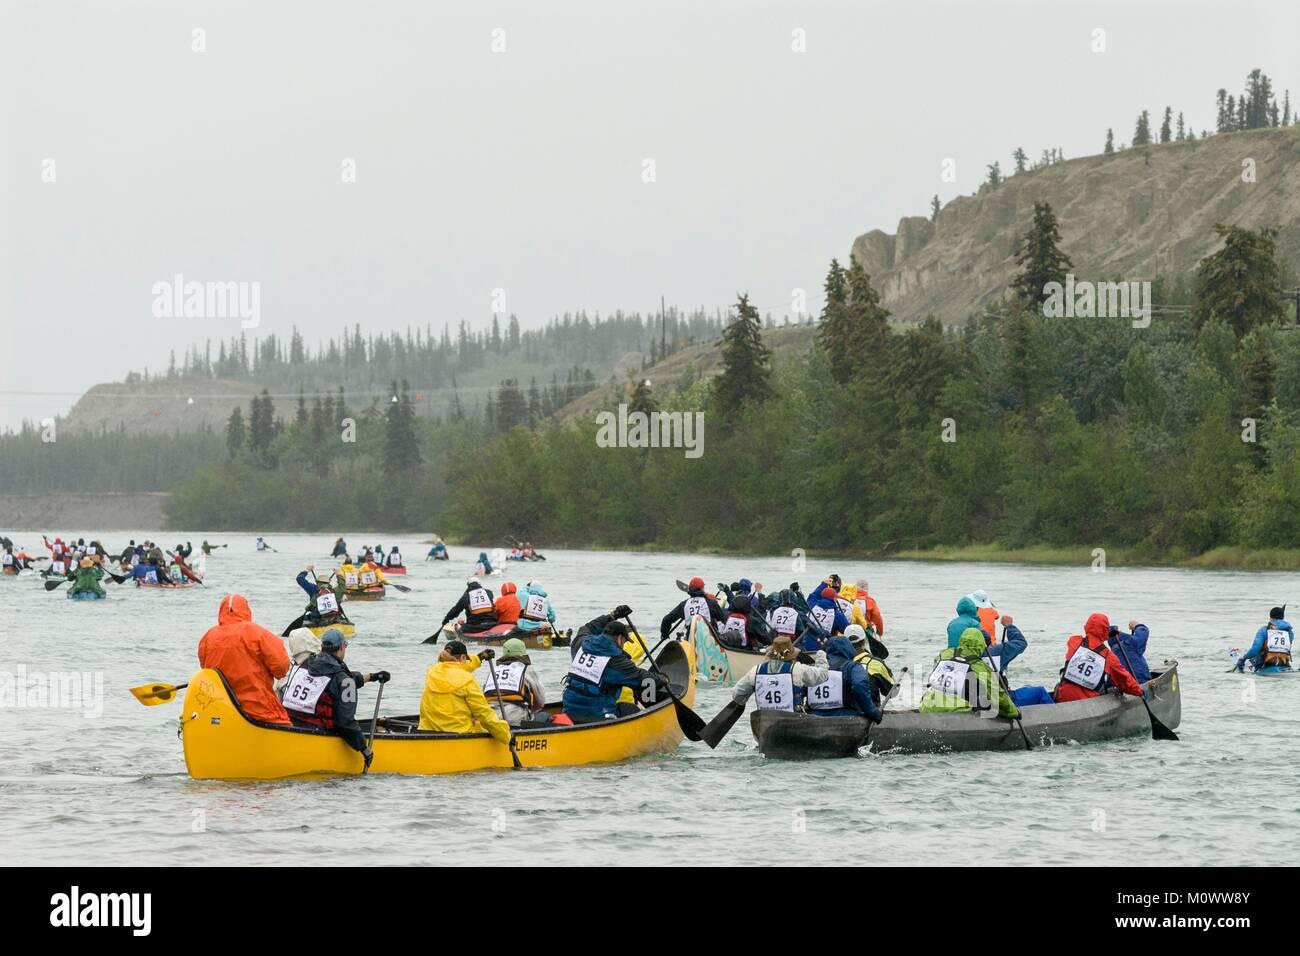 Canada,Yukon Territory,Whitehorse,Start of the Yukon River